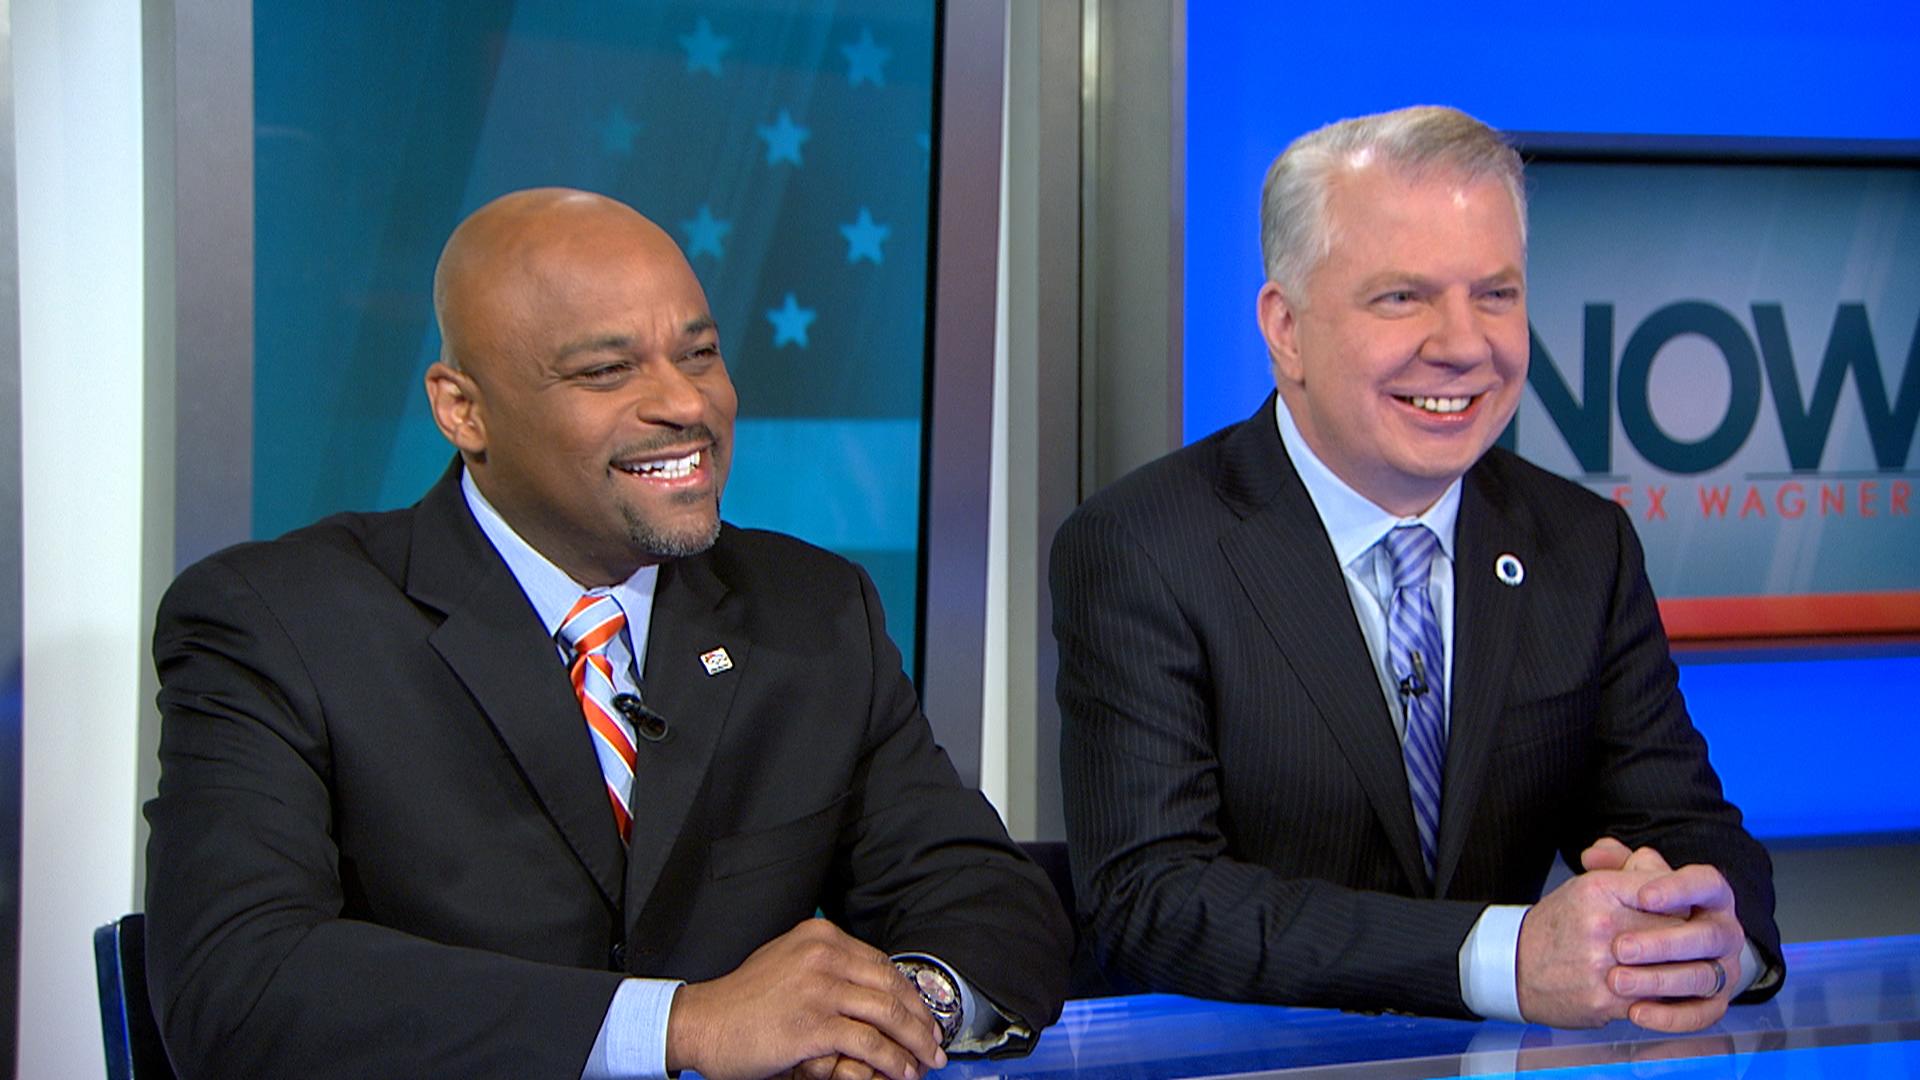 Super Bowl mayors talk progressive policy